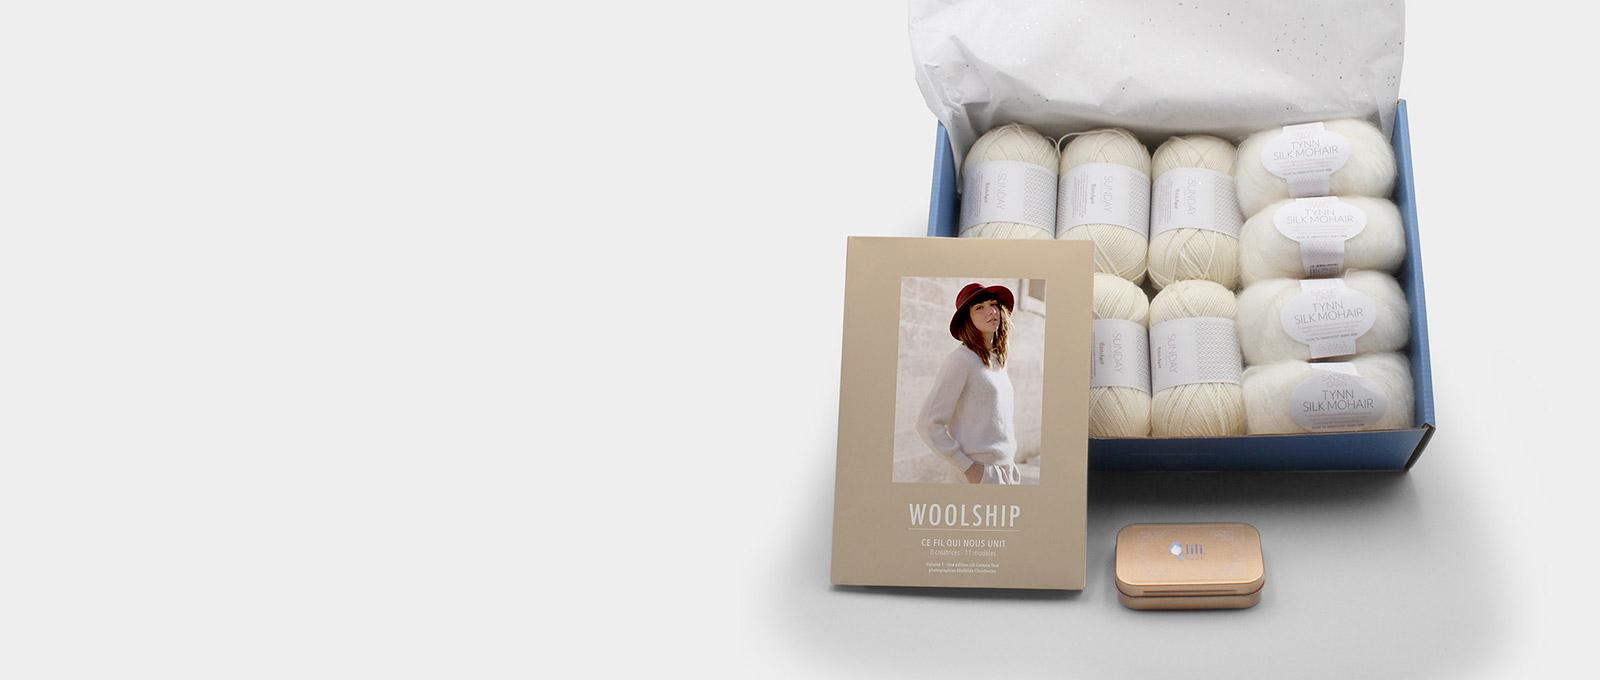 Coffret Woolship